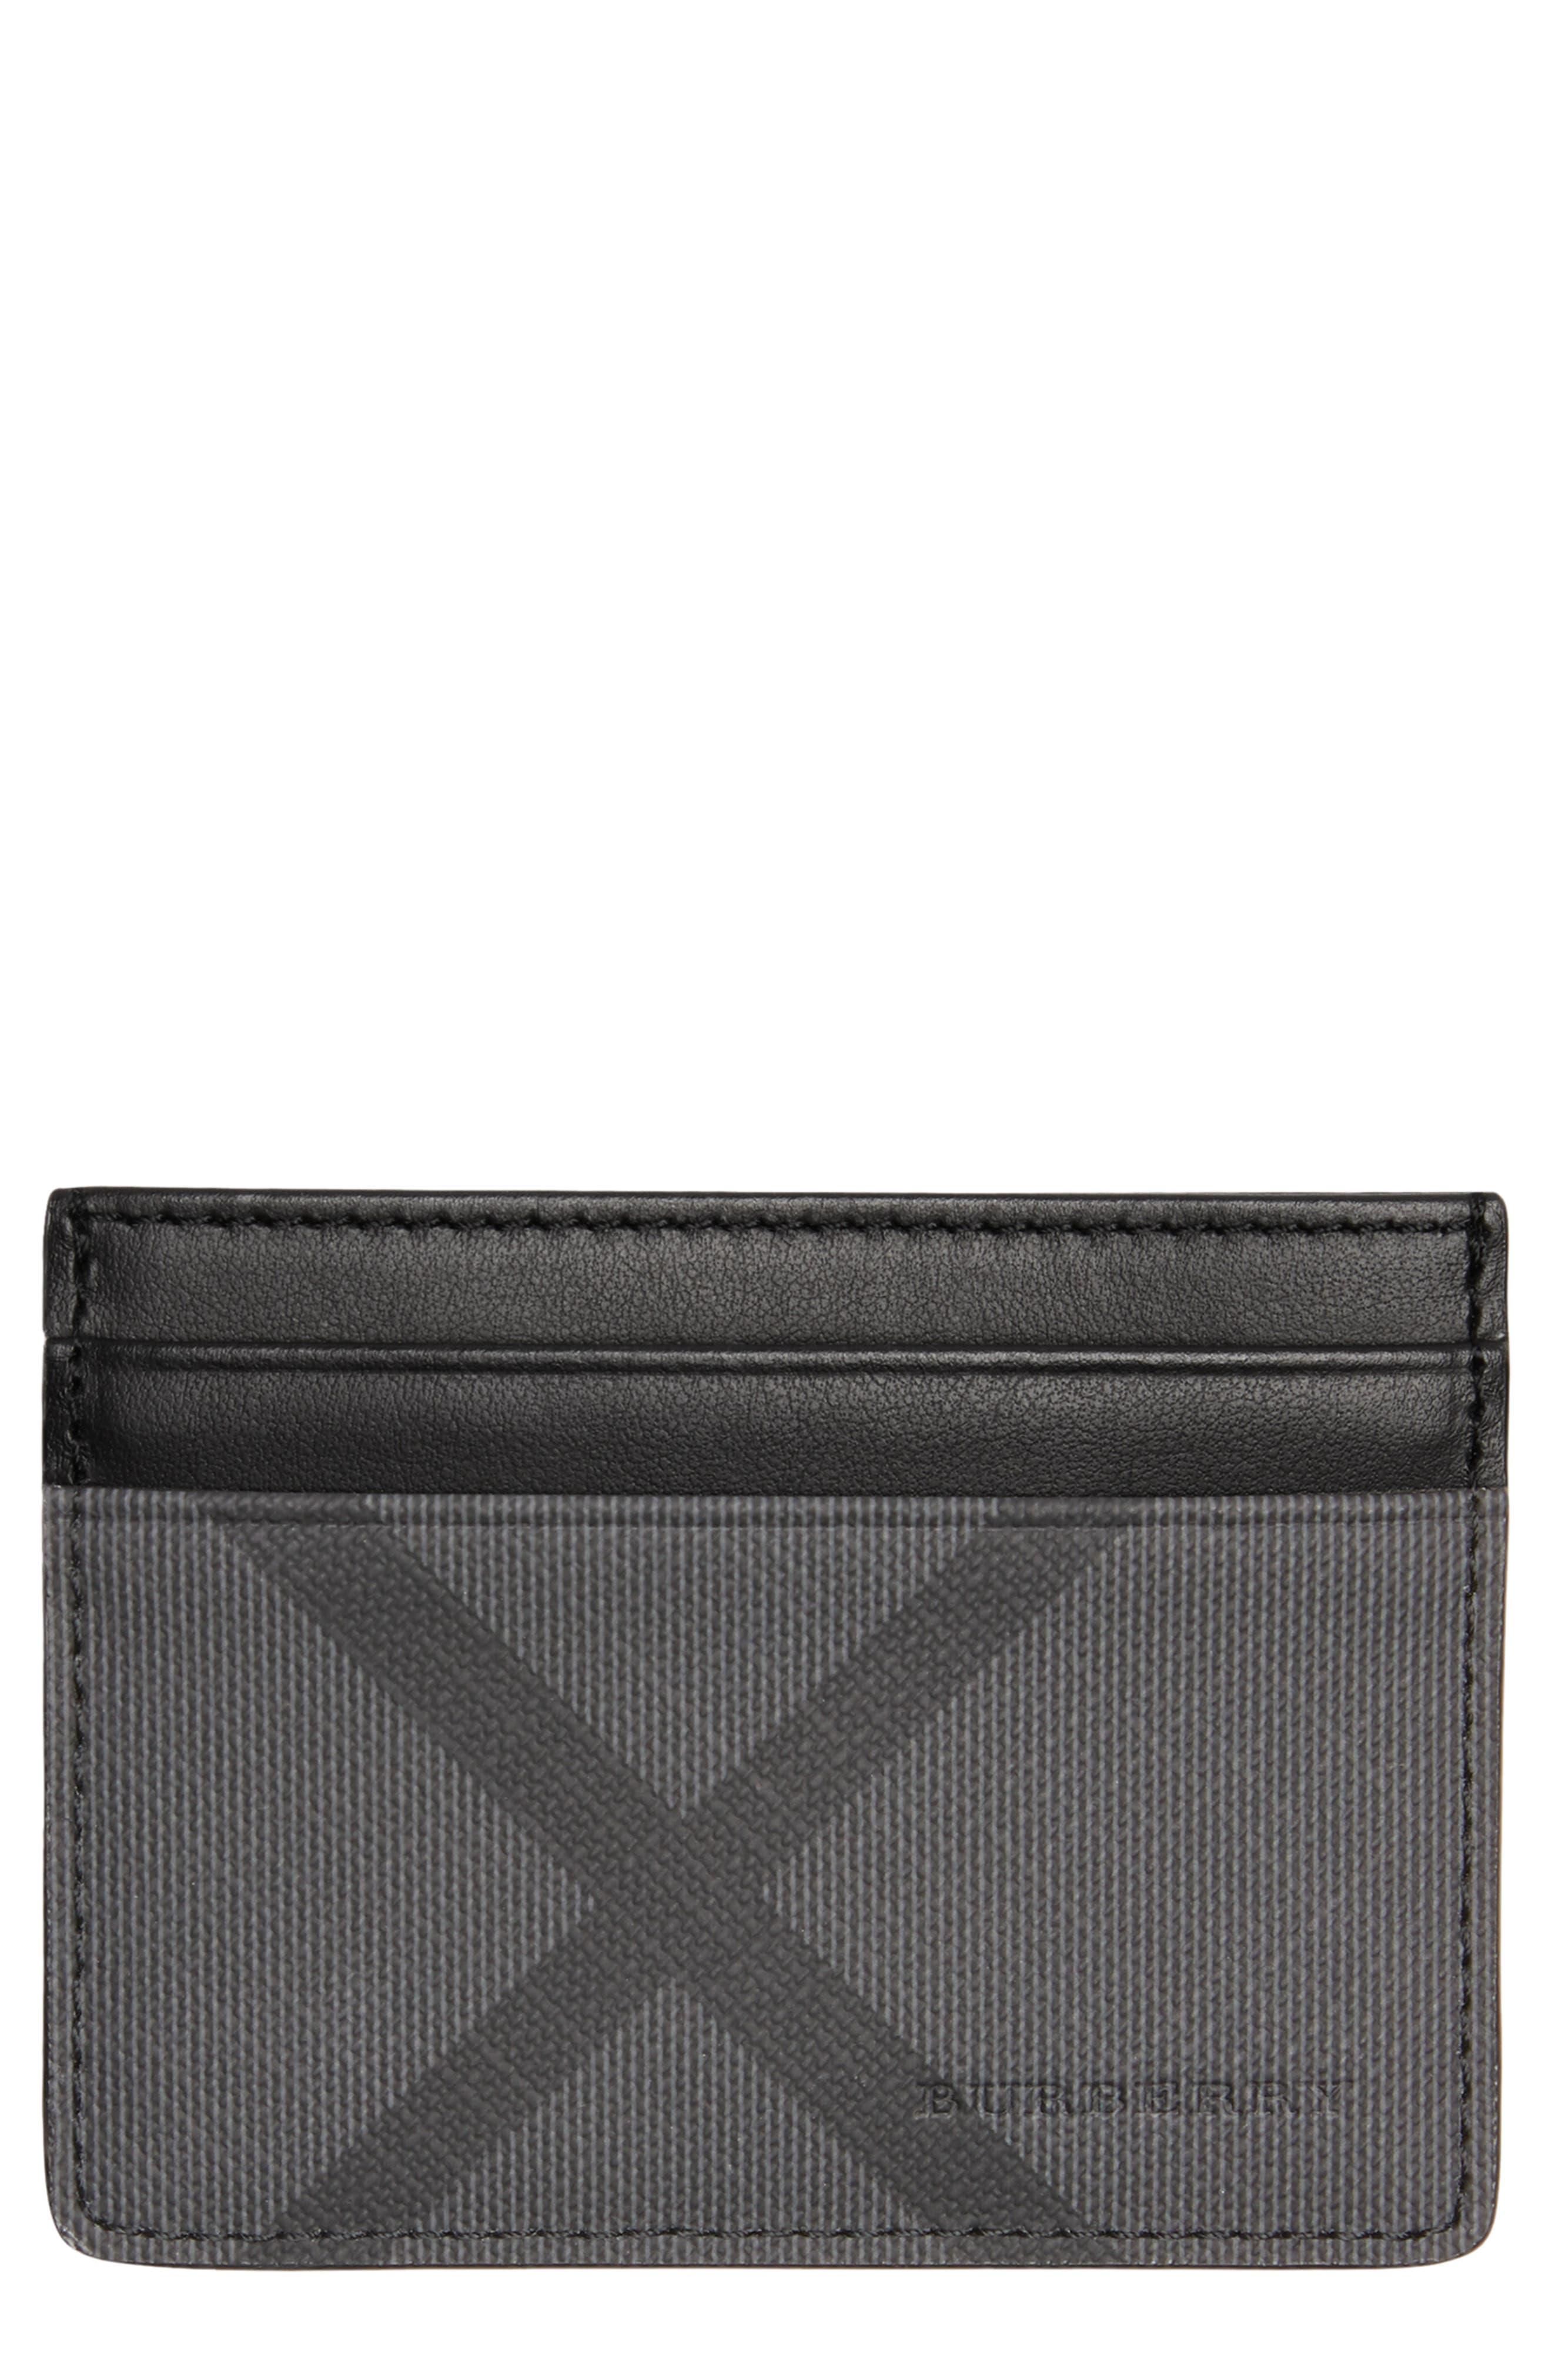 Sandon Card Case,                             Main thumbnail 1, color,                             CHARCOAL/ BLACK